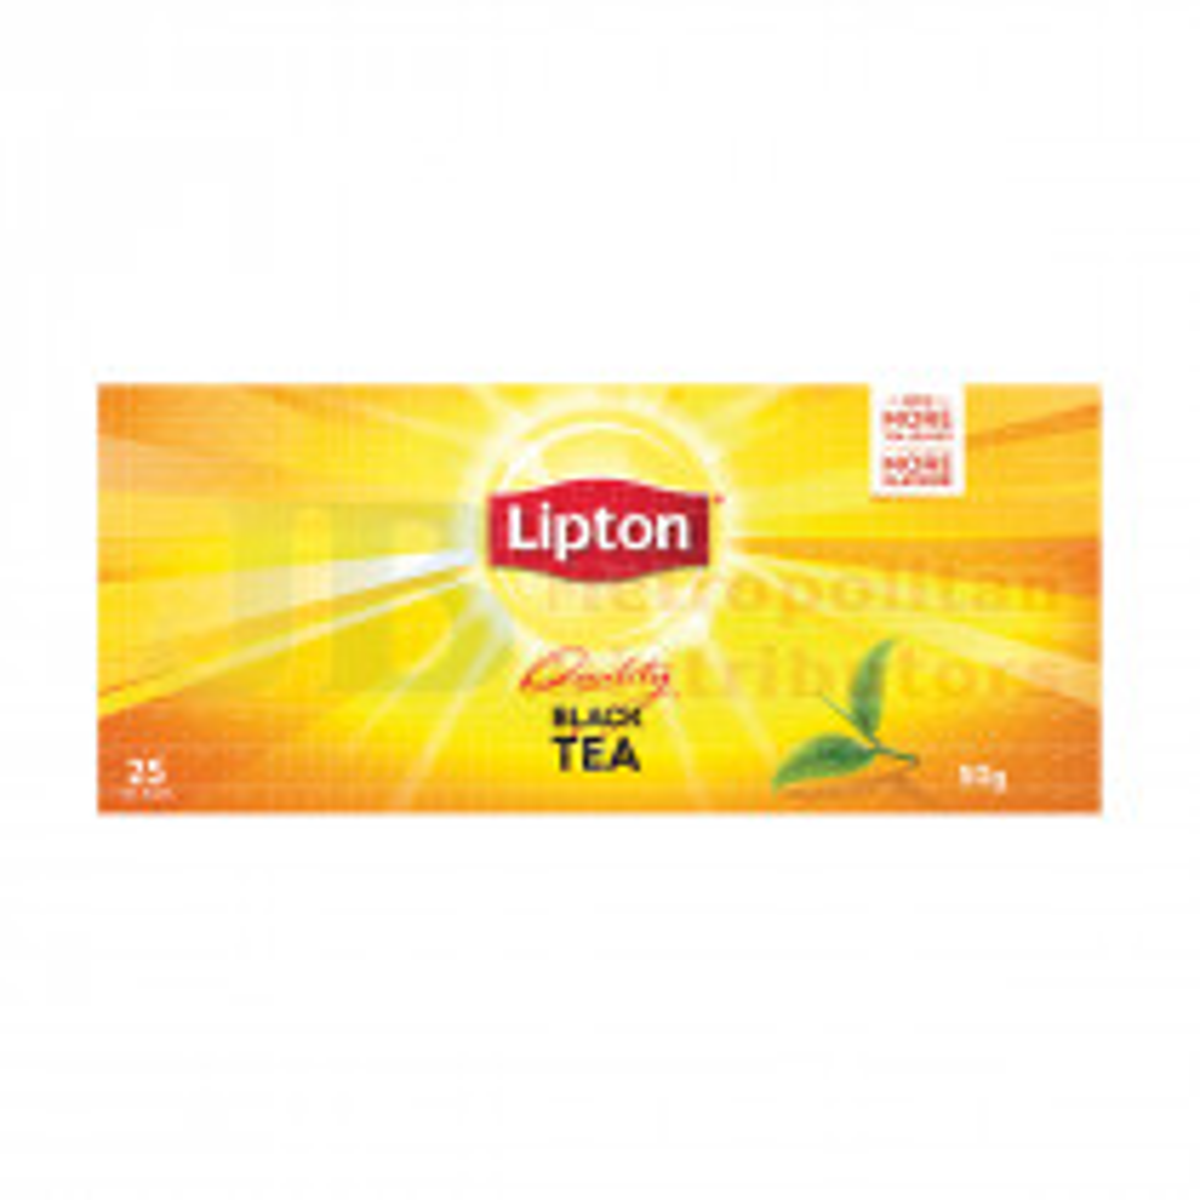 25PK LIPTON TEA BAGS BLACK